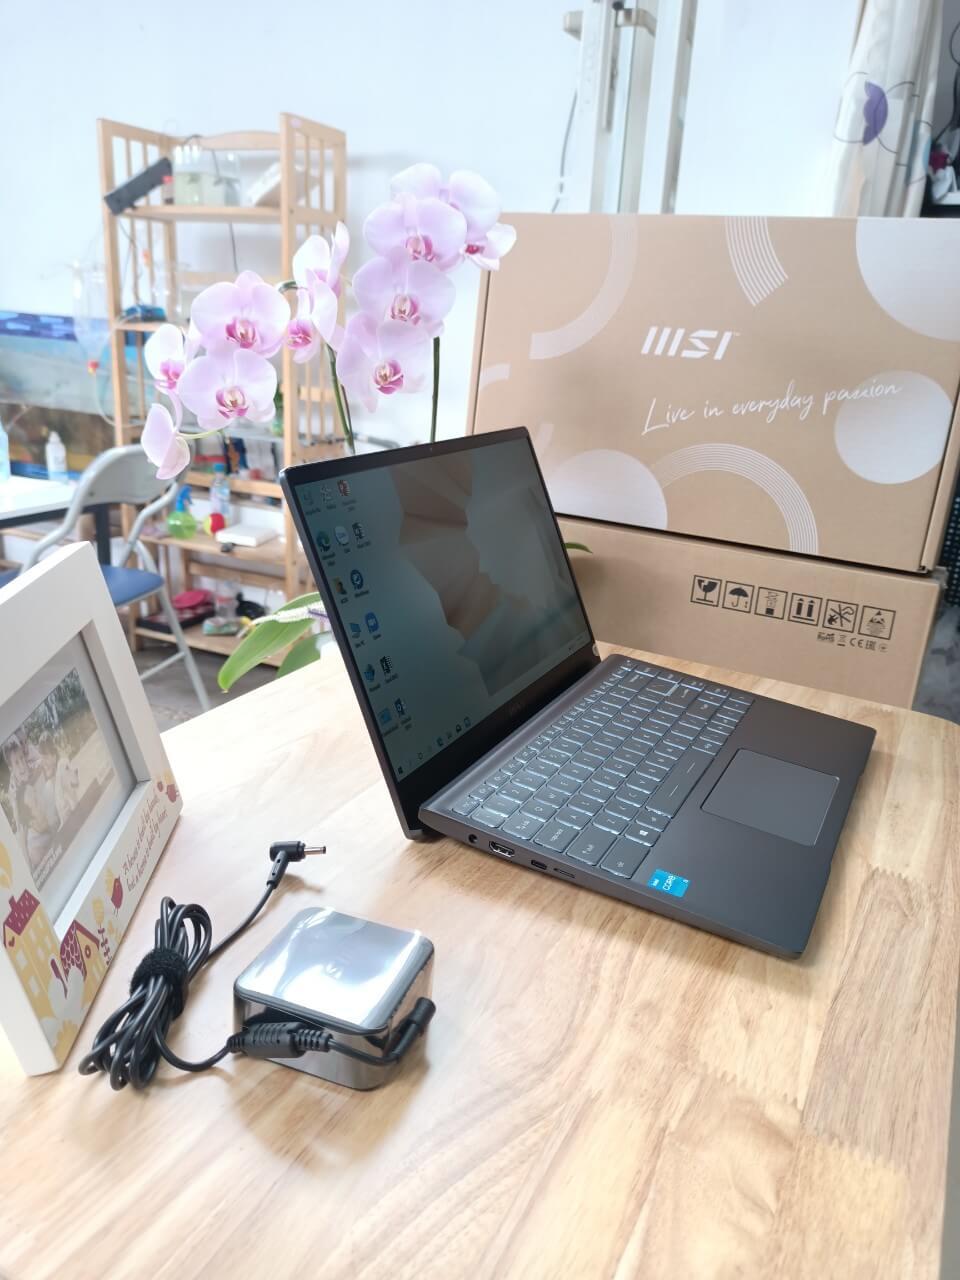 MSI Modern 14 B11MO-851VN : i3-1115G4   8GB RAM   256GB SSD   Intel UHD Graphics   14.0 FHD   Win 10   Gray